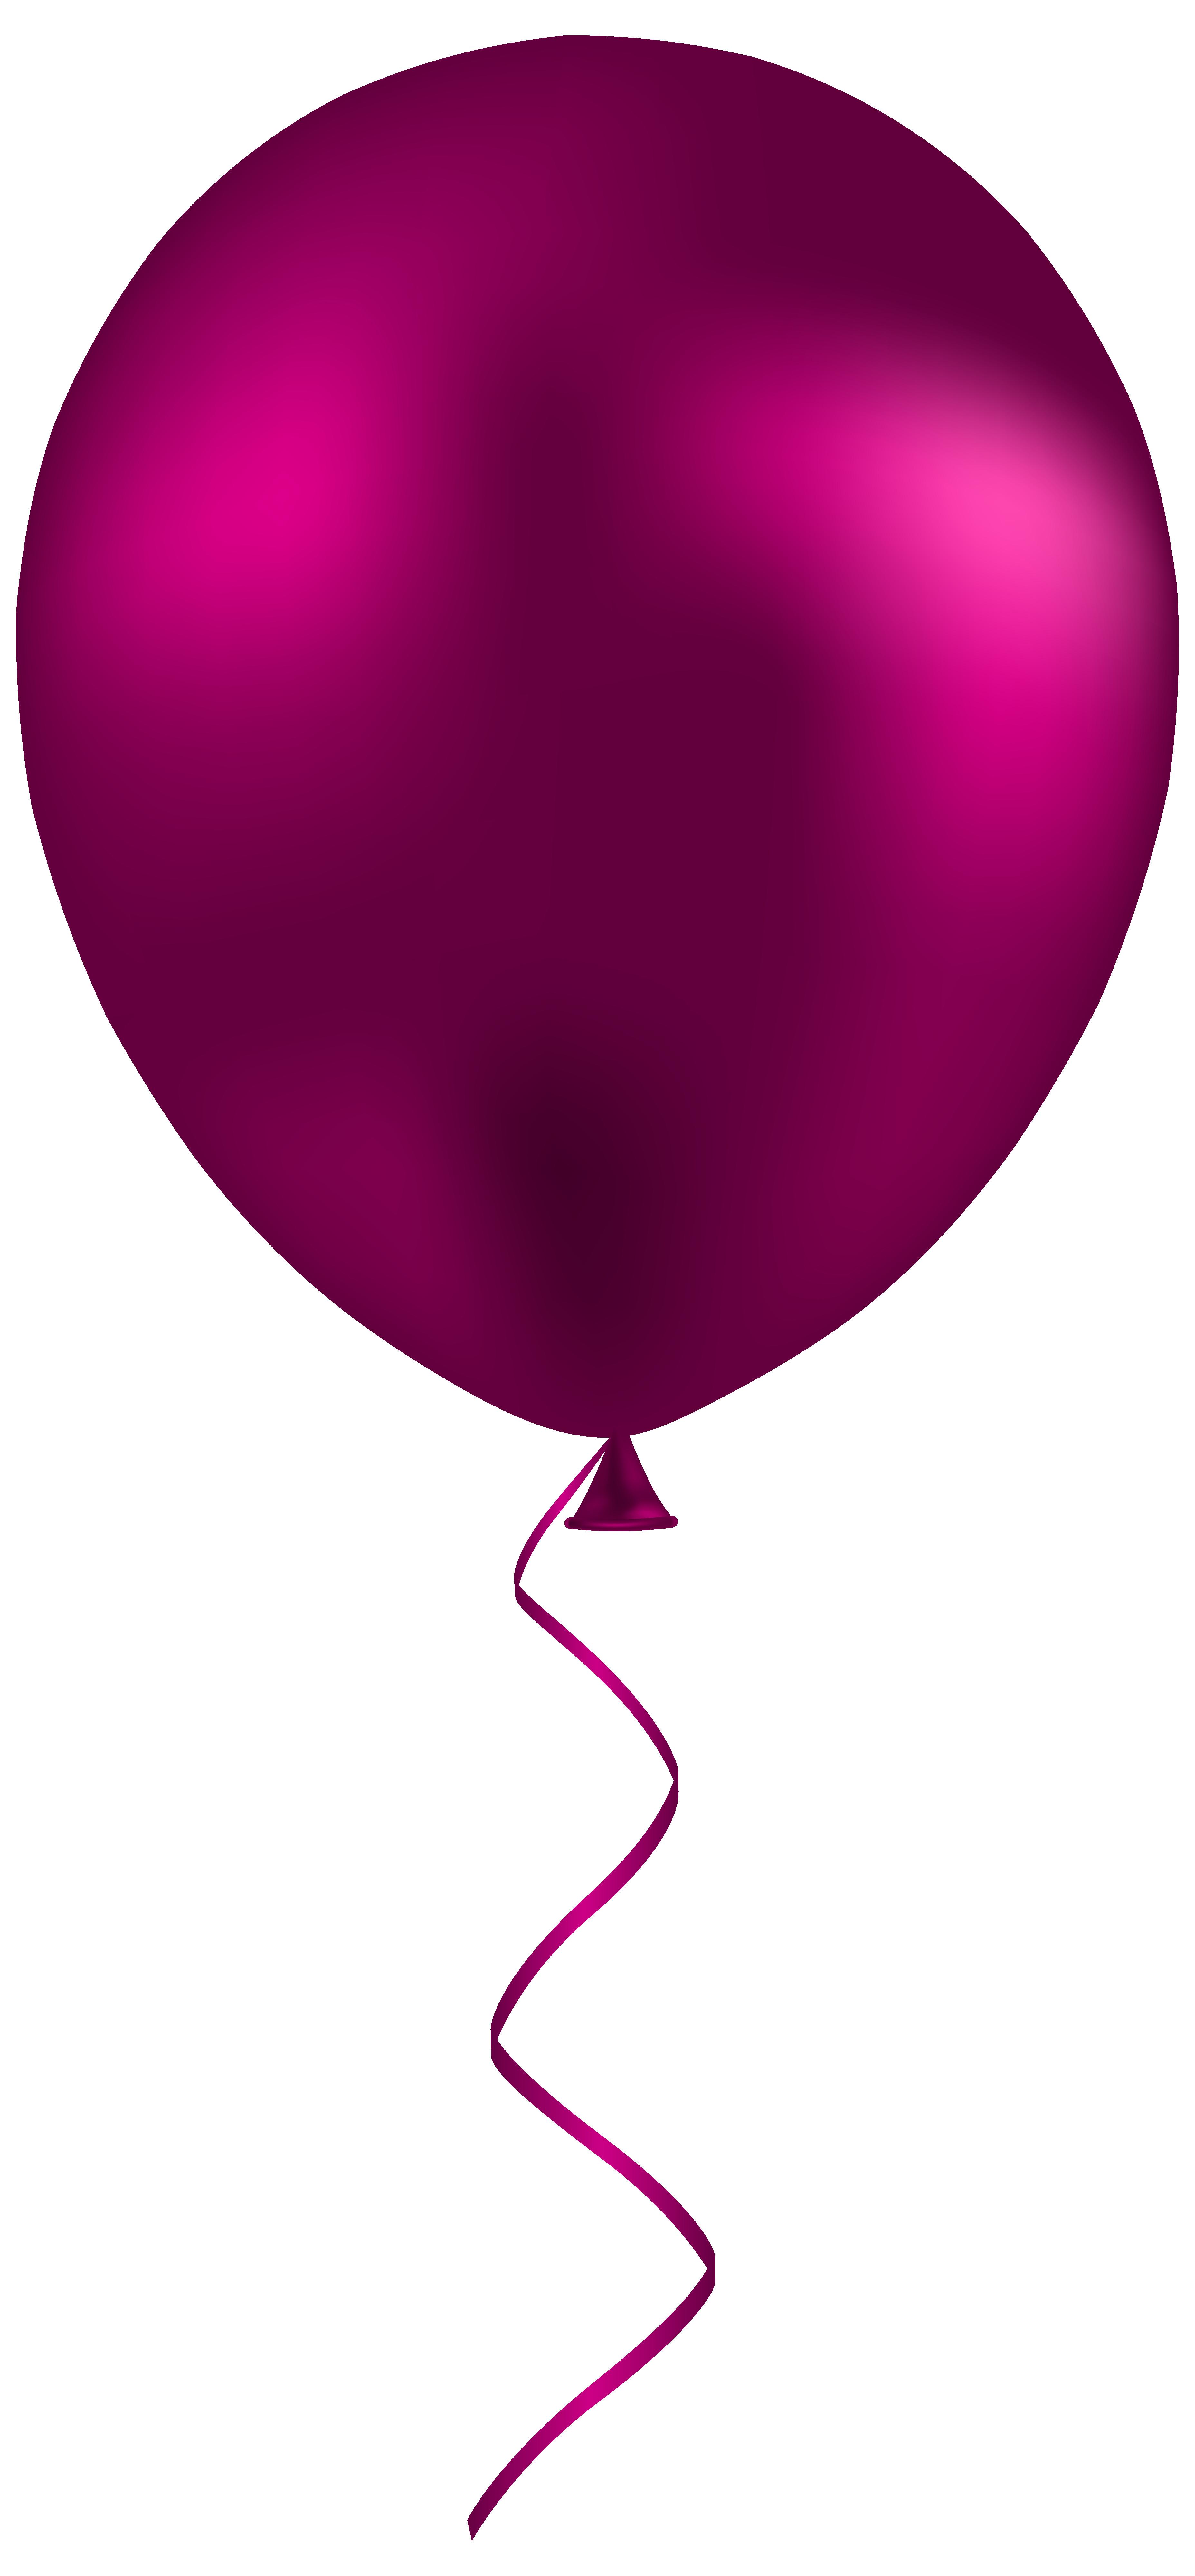 3711x8000 Purple Balloons Clip Art Szukaj W Google Gif Picturesque